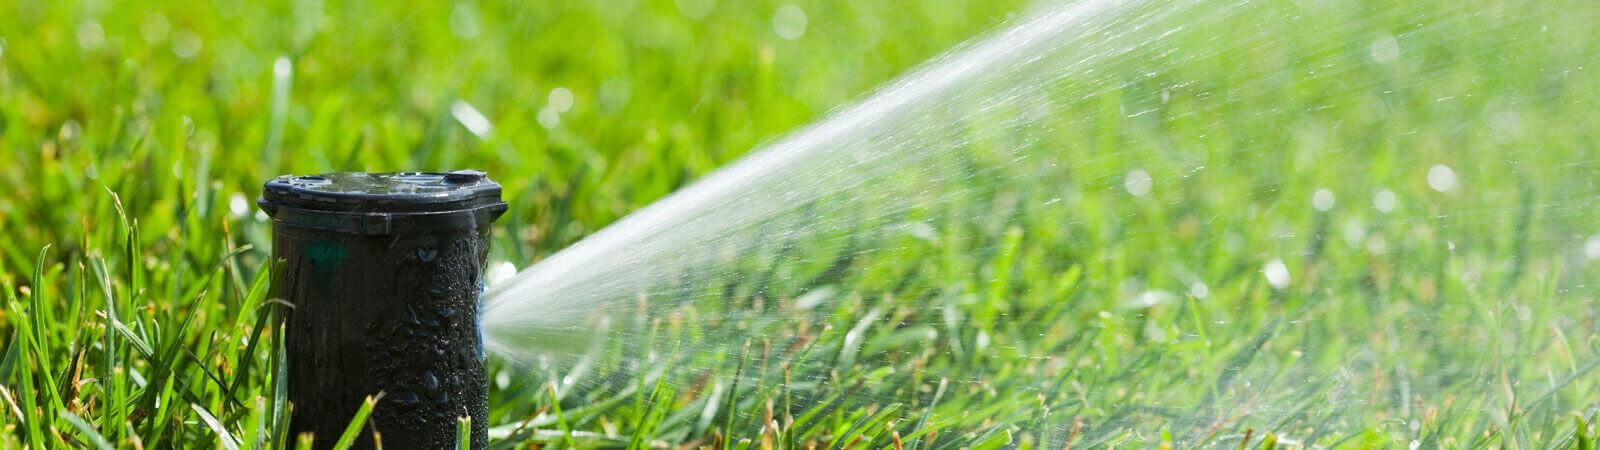 Diffuser watering lawn